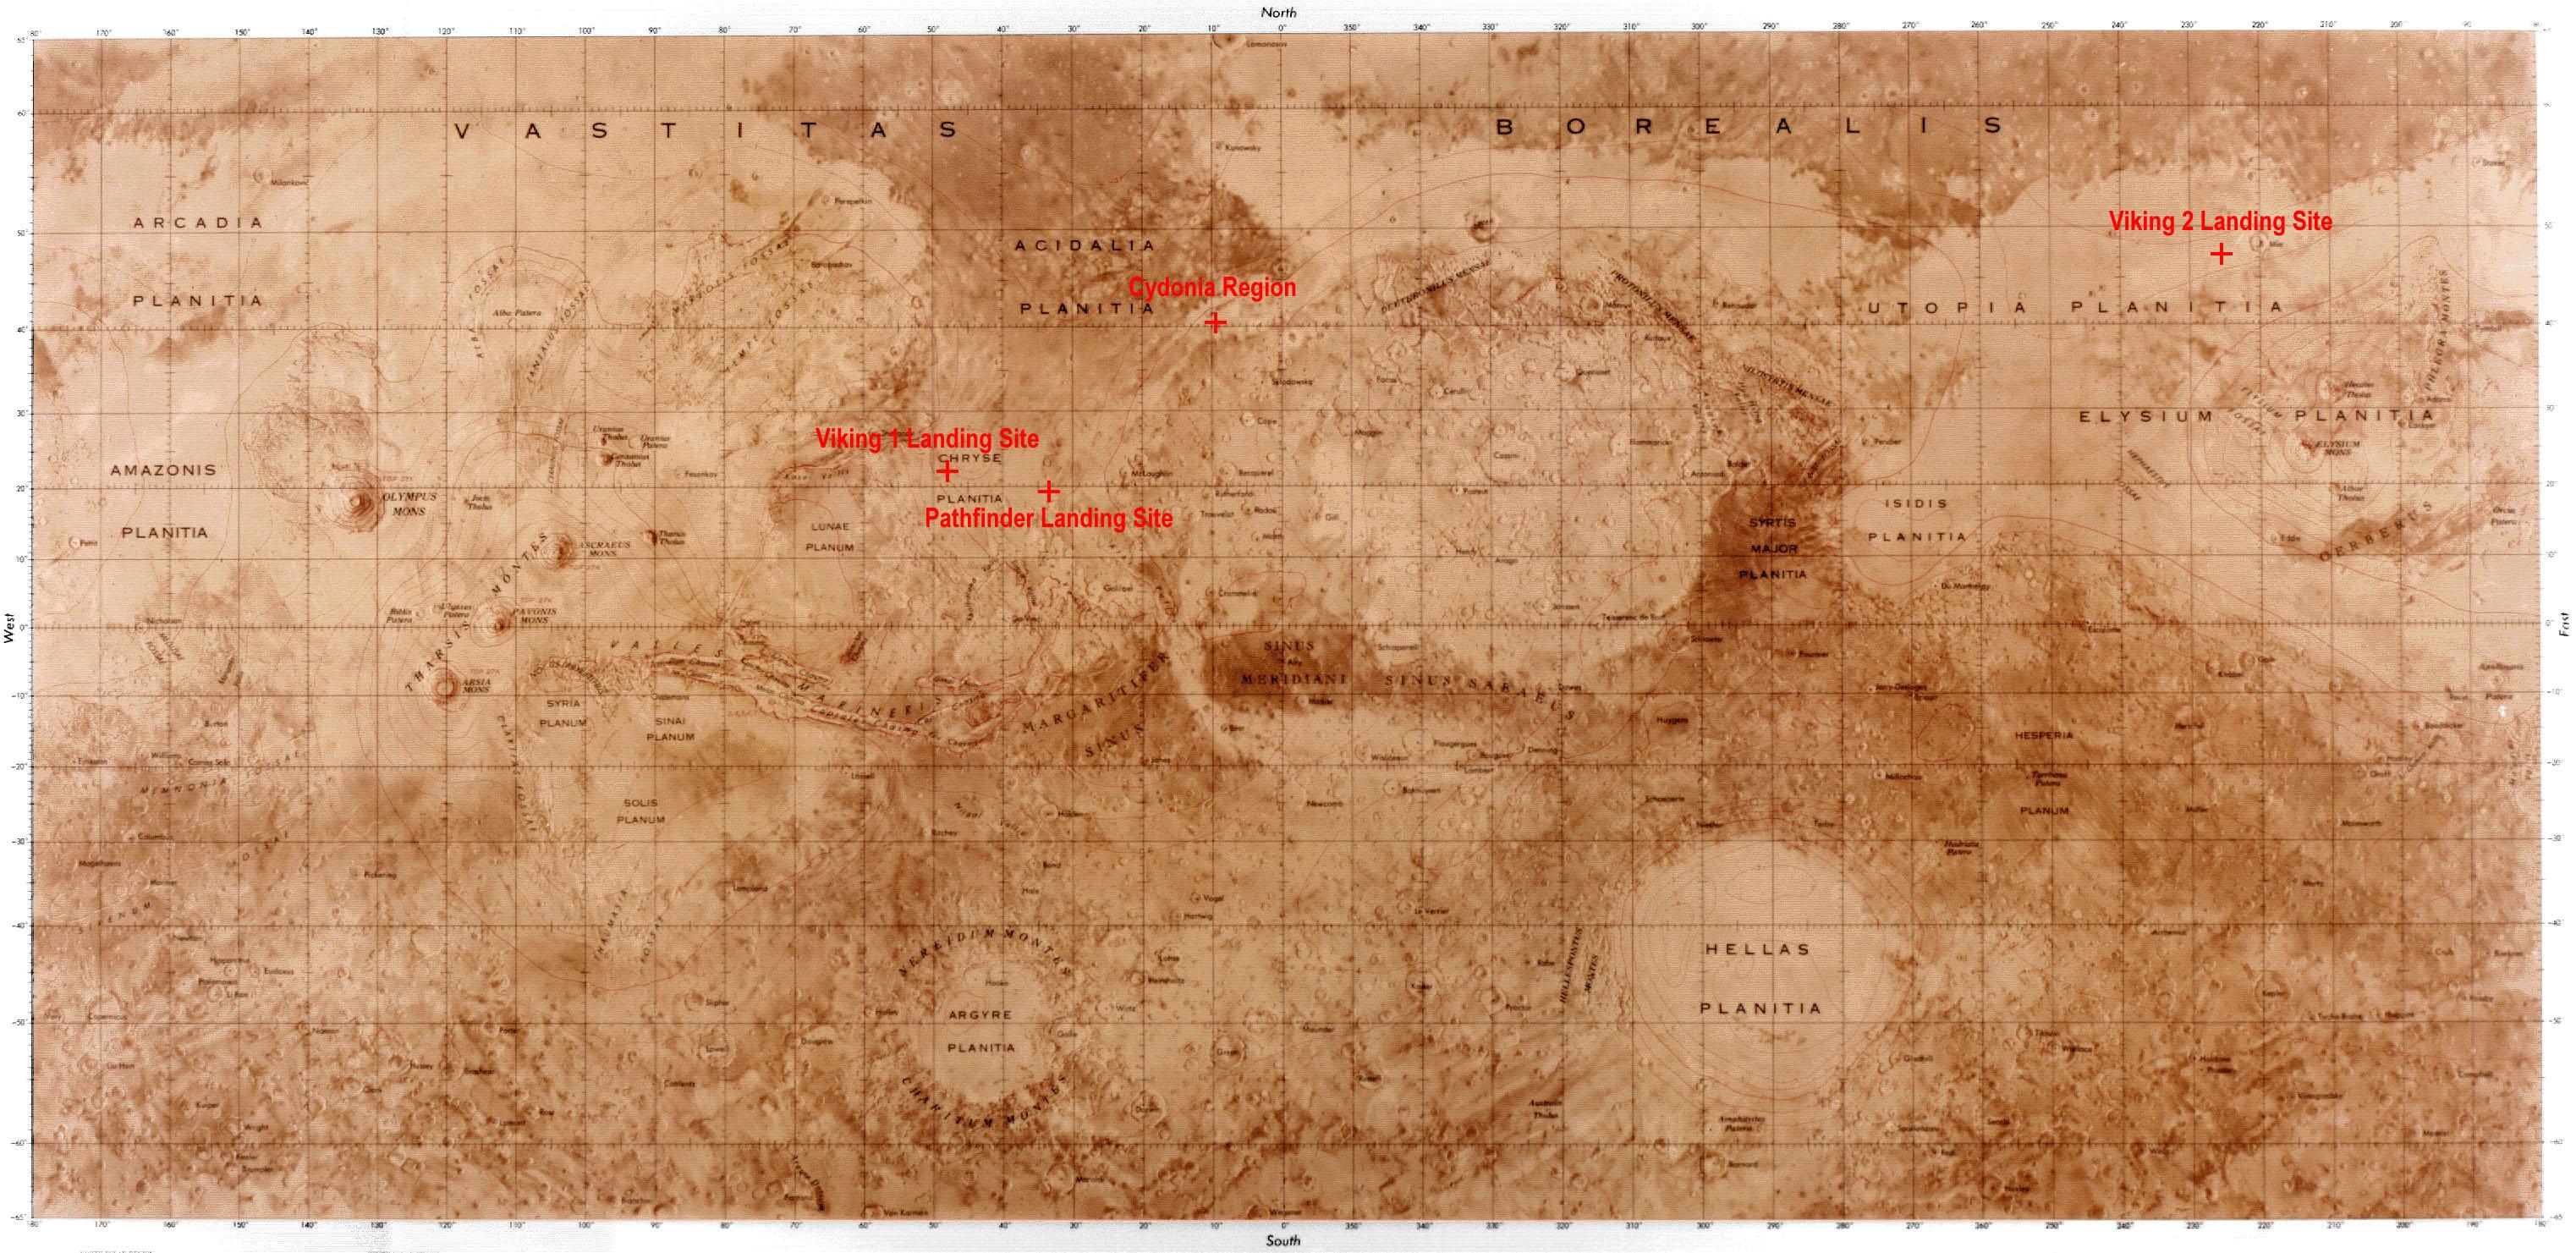 marsmap1b.jpg